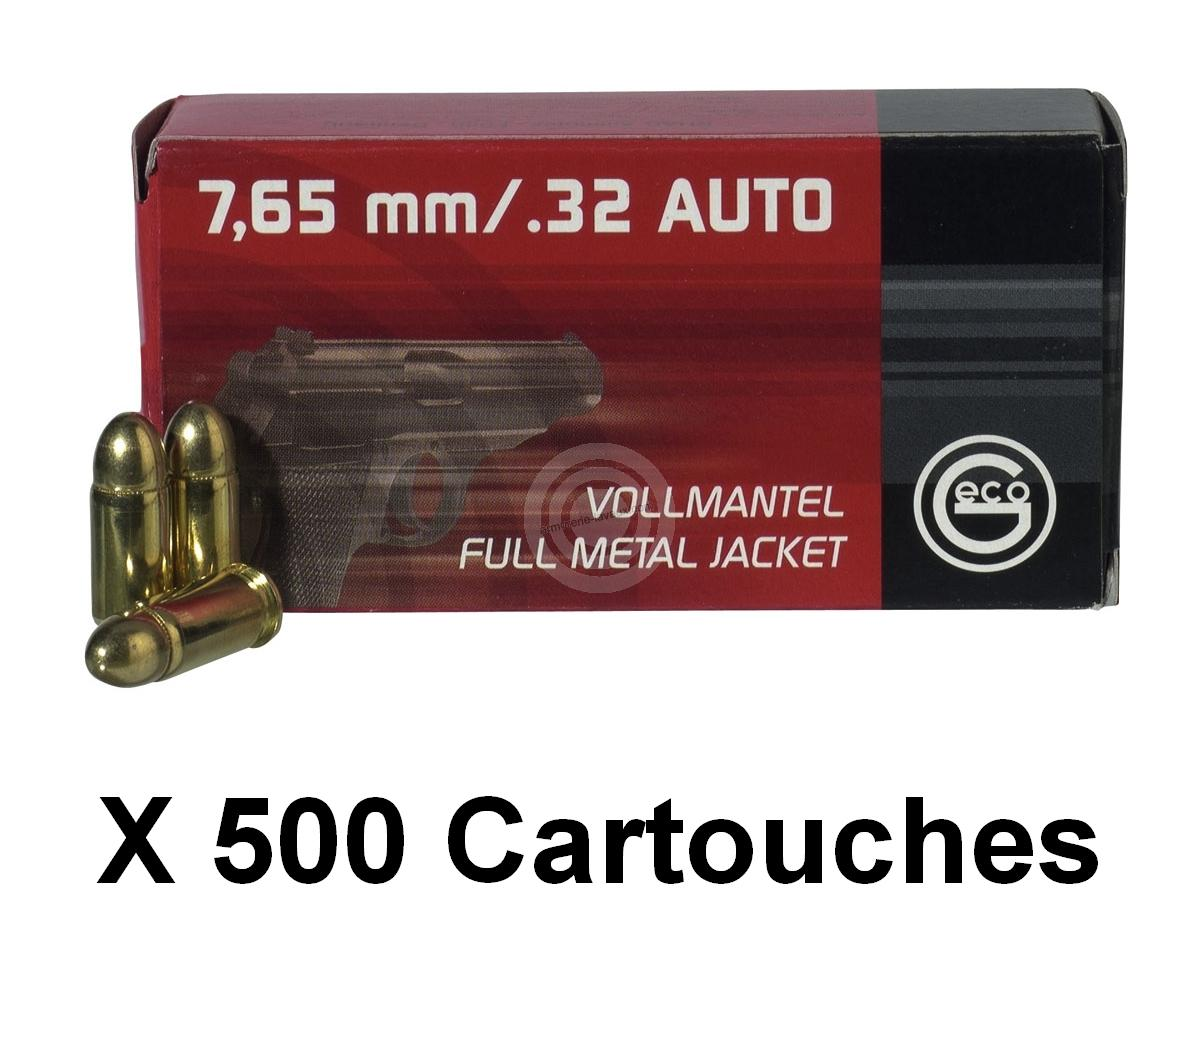 GECO cal.7,65 mm (.32 Auto) FMJ Round Nose /500 cartouches